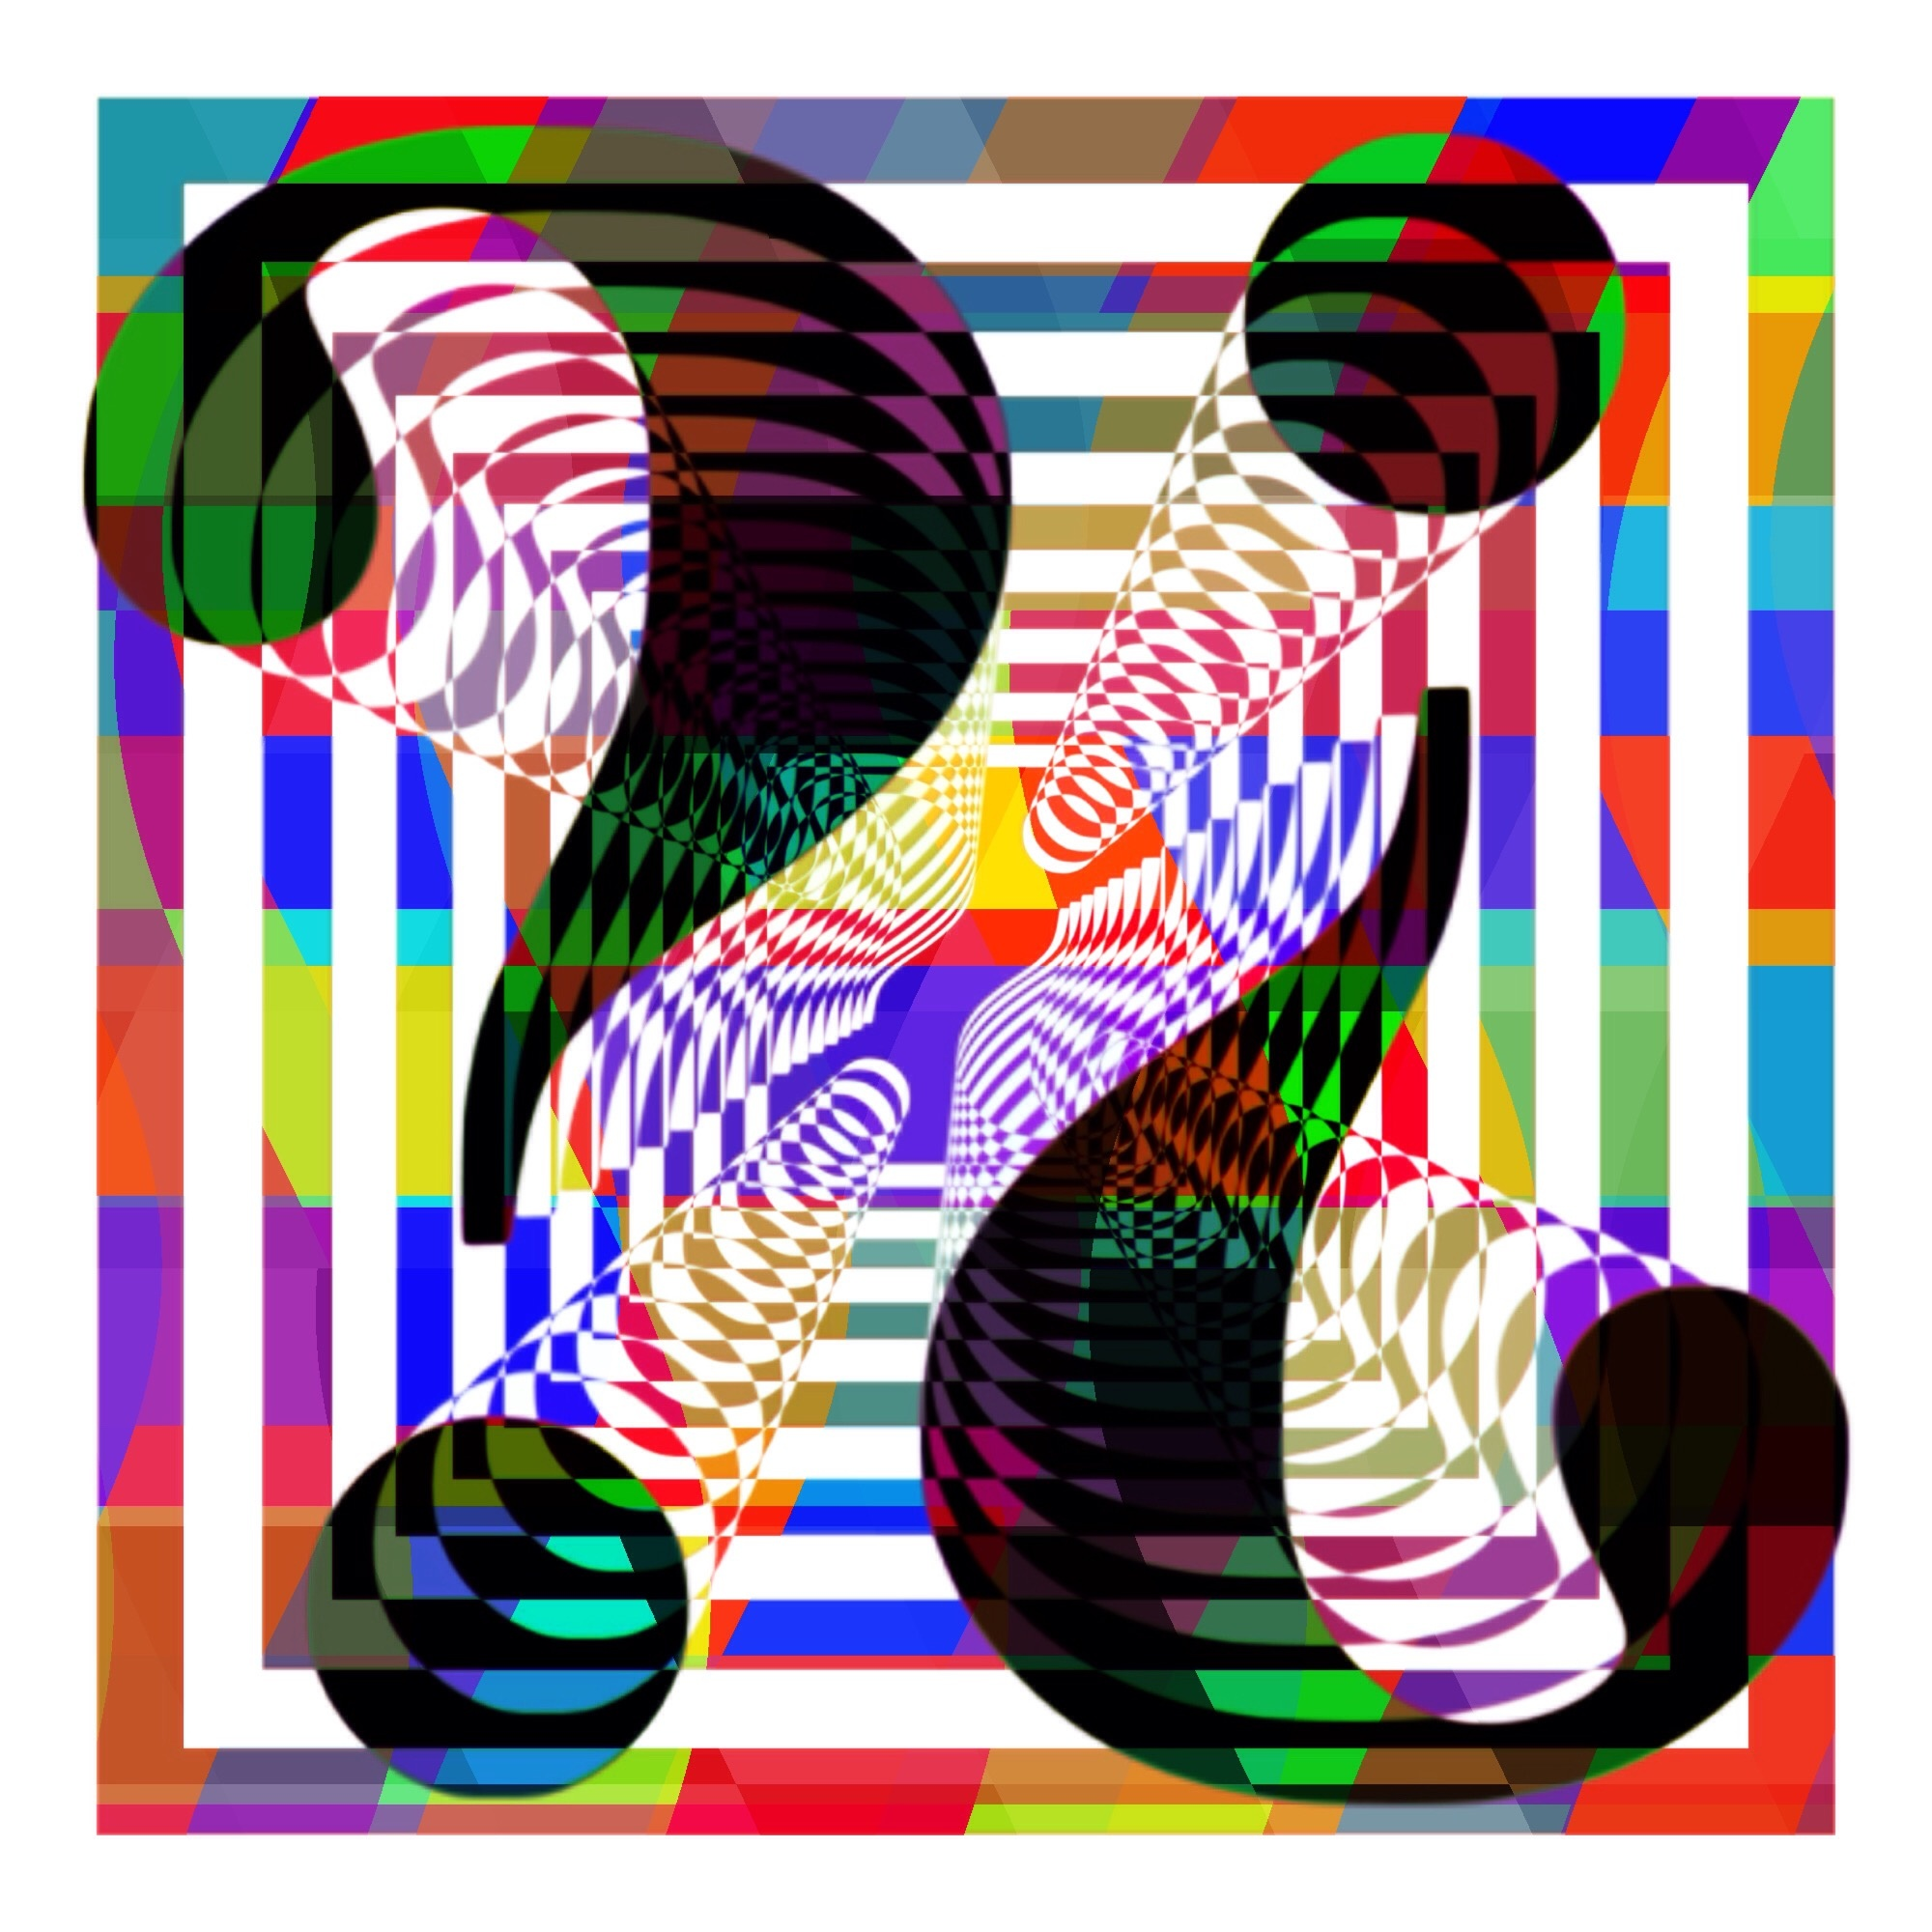 96 [3am BB beats 96bpm Project]